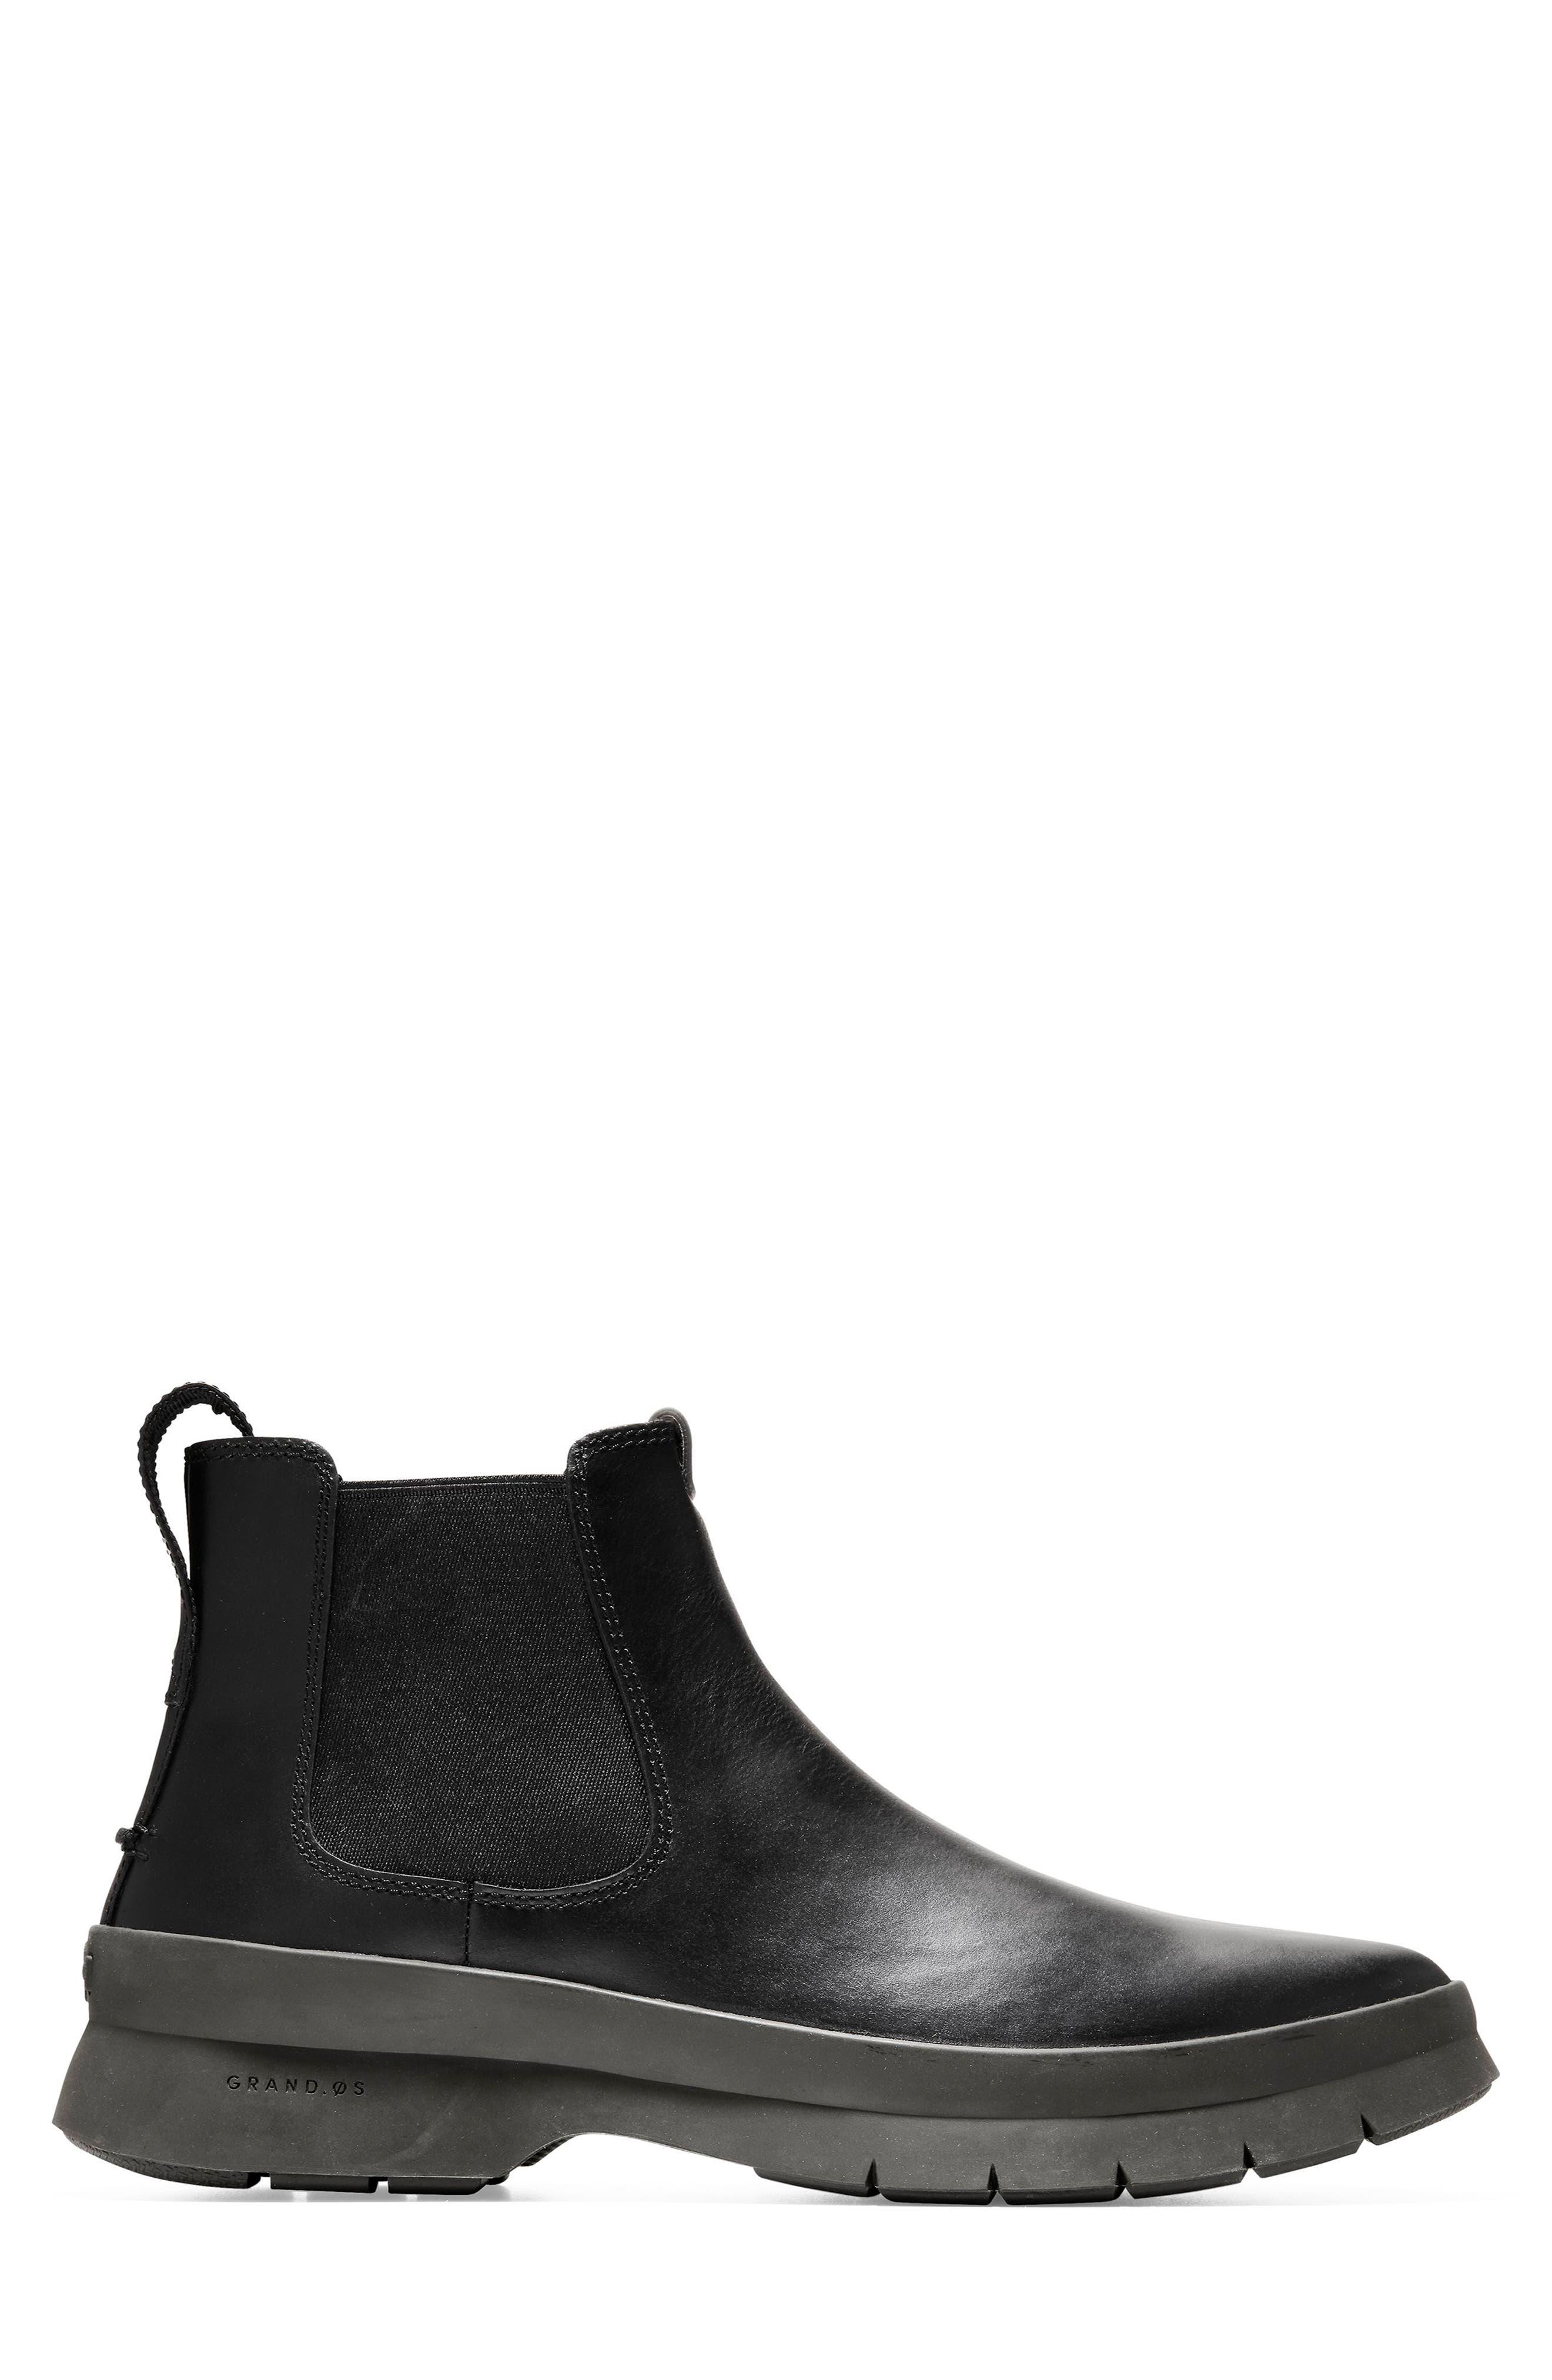 Pinch Utility Waterproof Chelsea Boot,                             Alternate thumbnail 3, color,                             BLACK/ HAZEL LEATHER